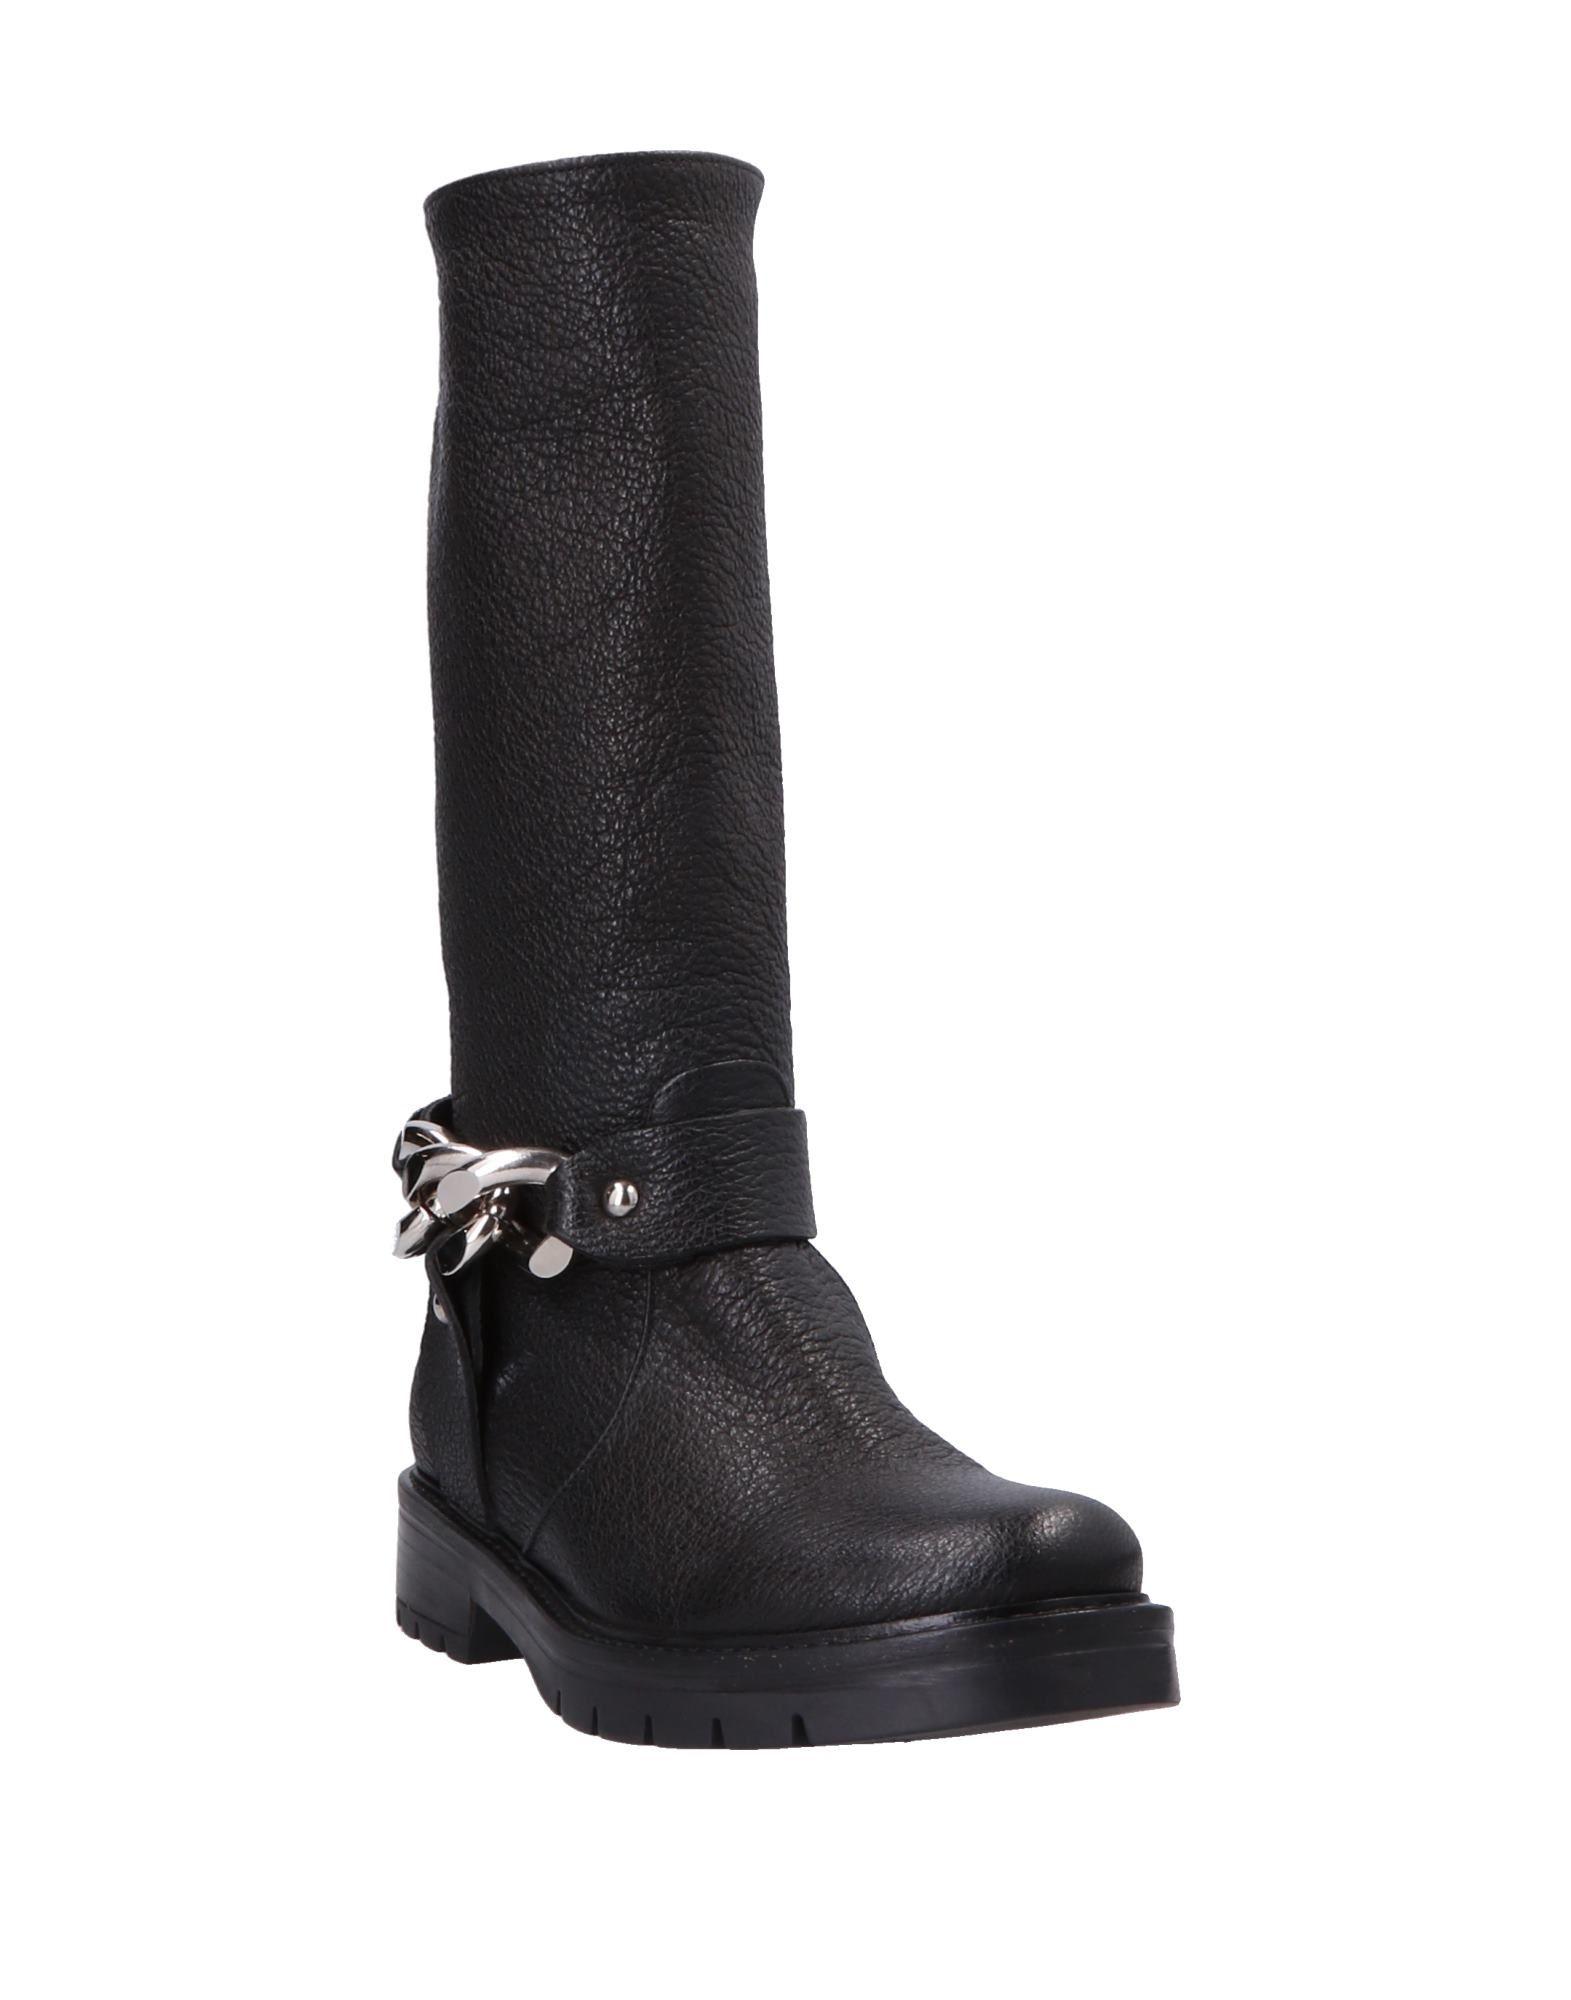 Stilvolle billige Schuhe Angelo Bervicato 11545573VL Stiefel Damen  11545573VL Bervicato 1ee2b2